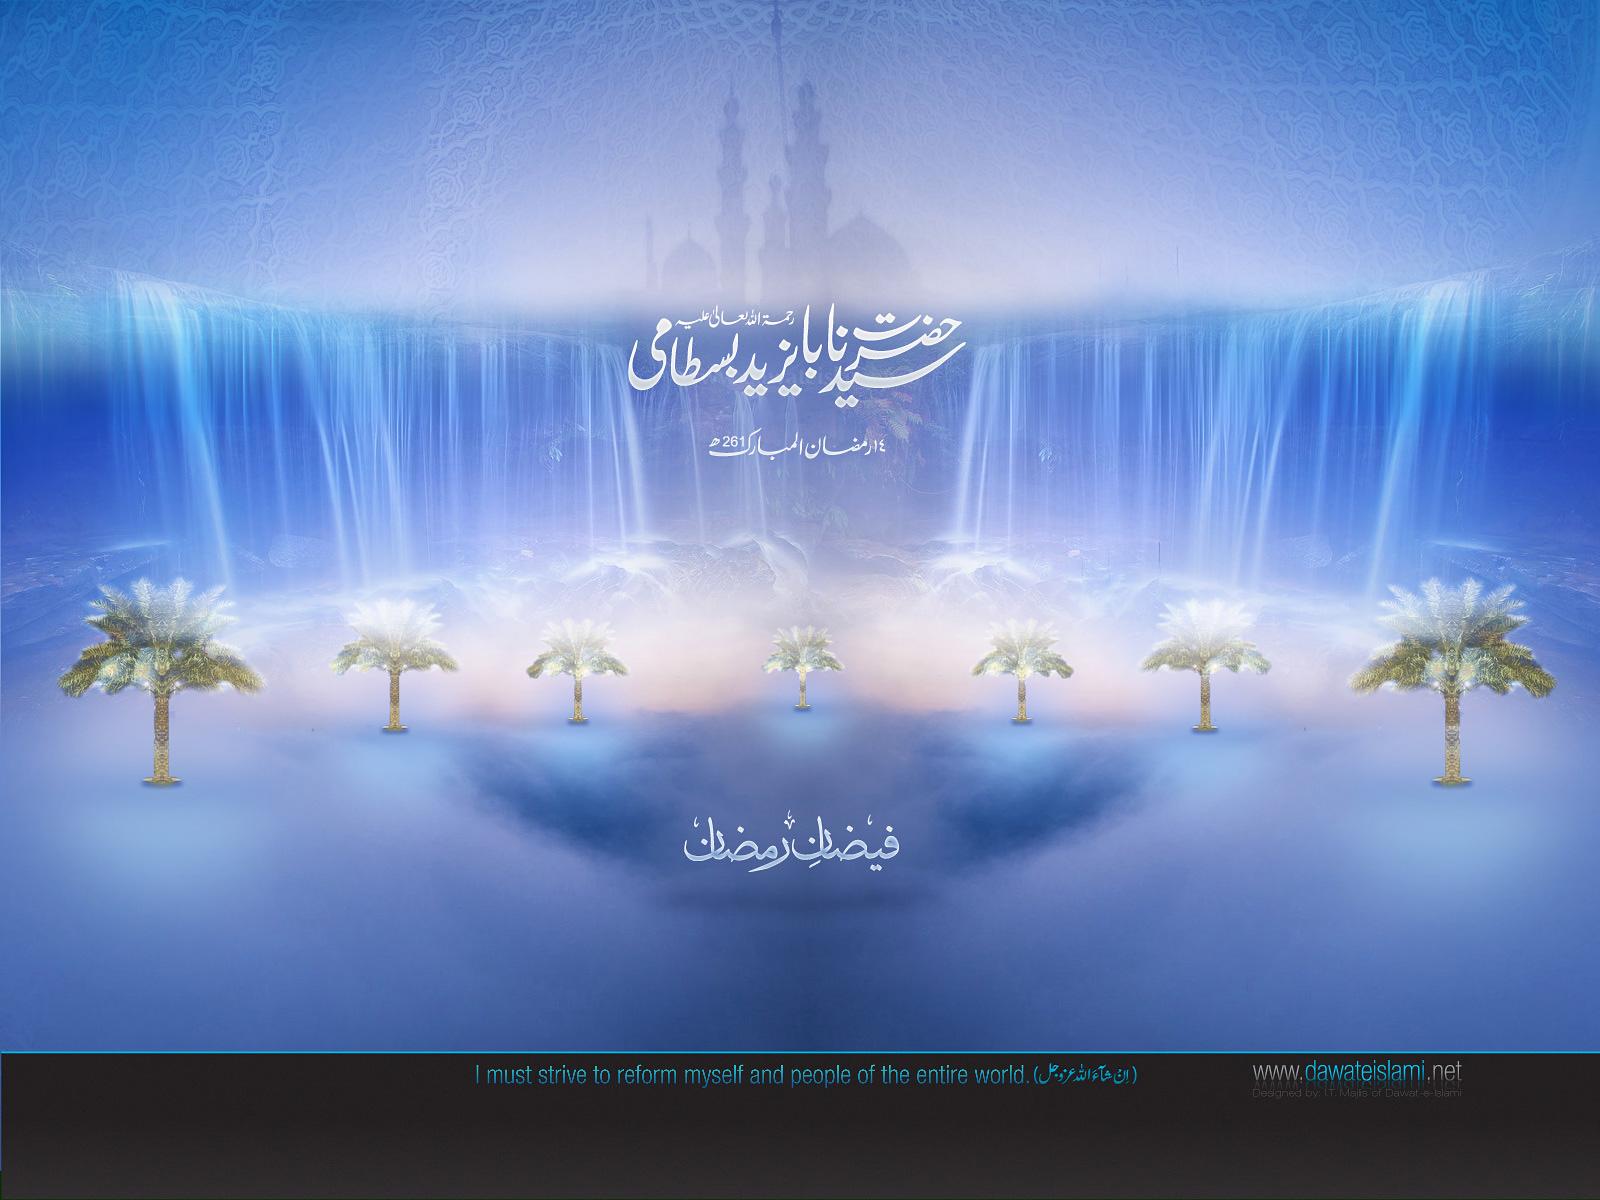 God Quotes Wallpaper Hd Islami Wallpaper Ramadan Wallpapers